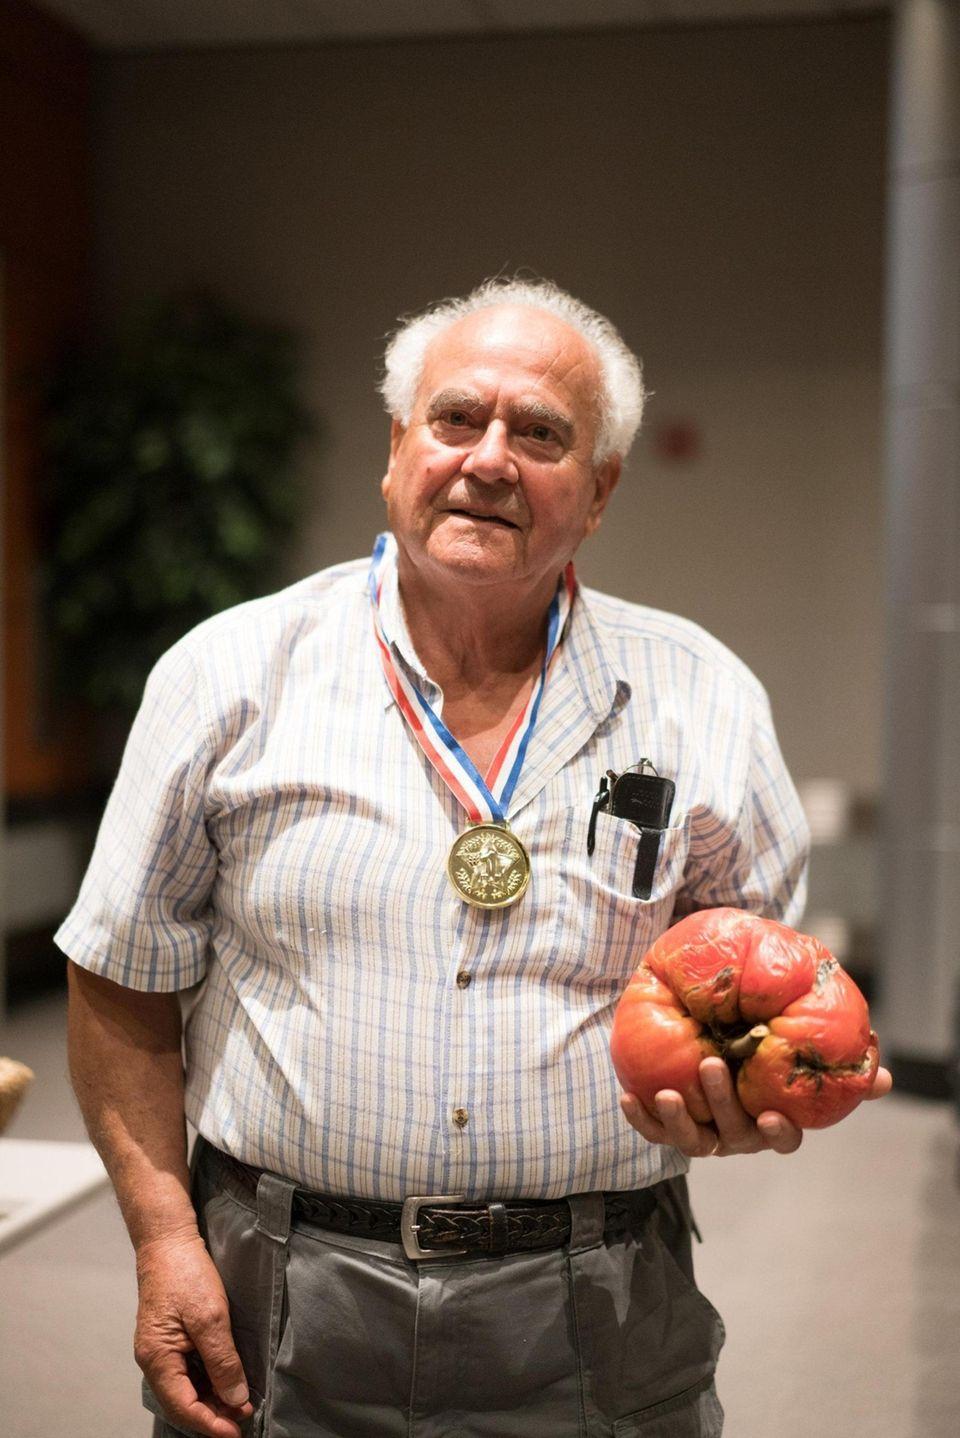 Anthony Maltese, 86, of Massapequa, winner of Newsday's